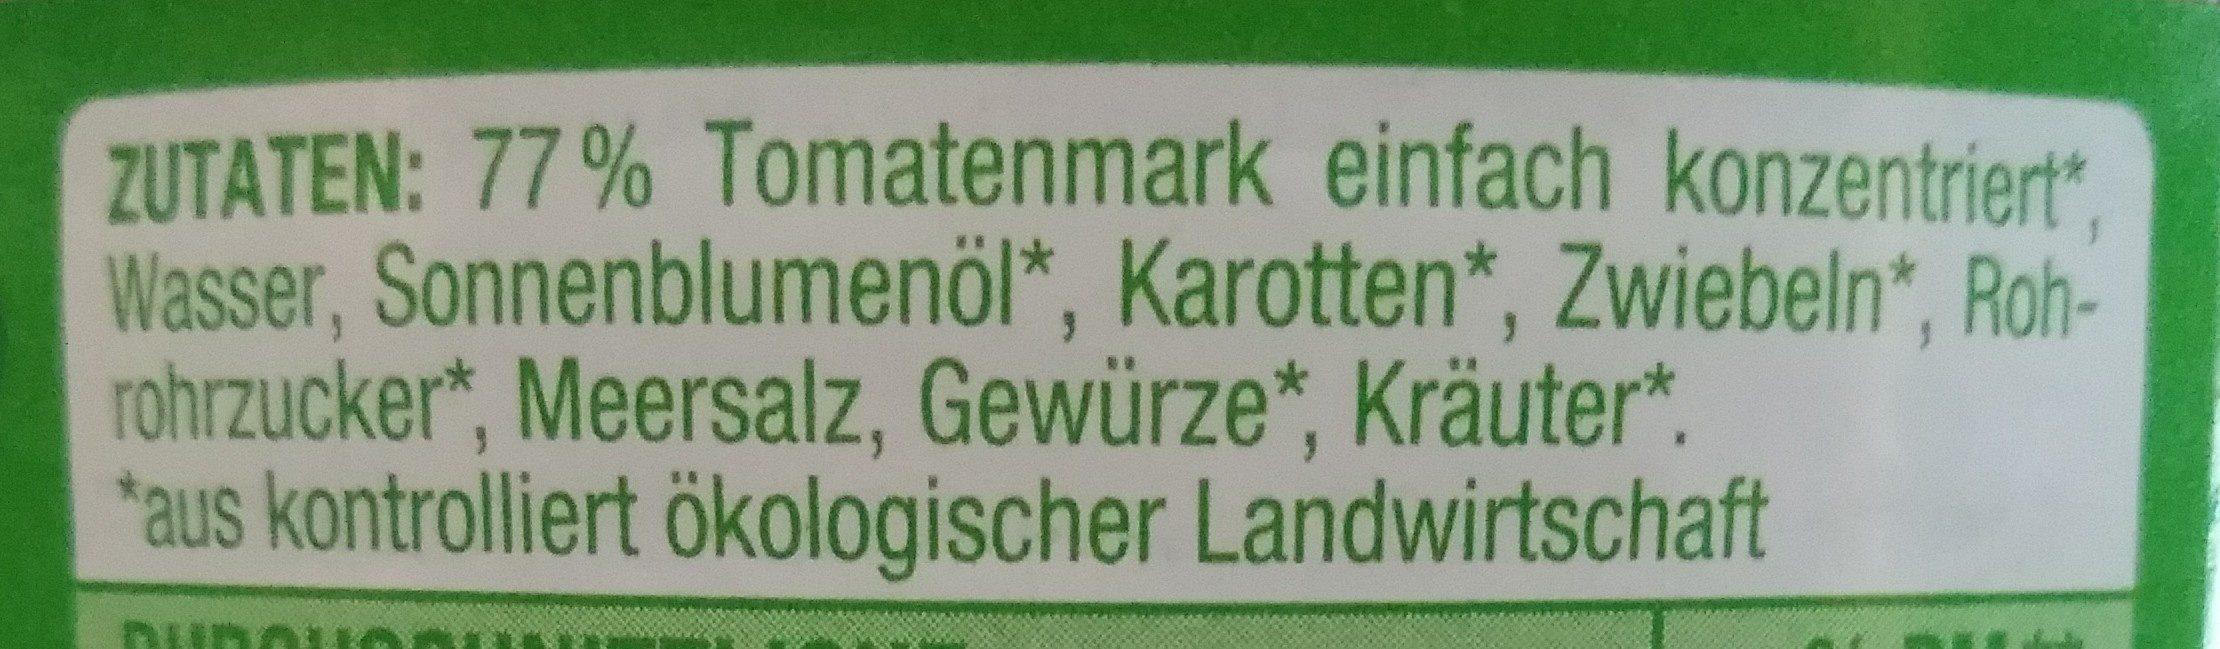 Tomatensauce Klassik - Ingrédients